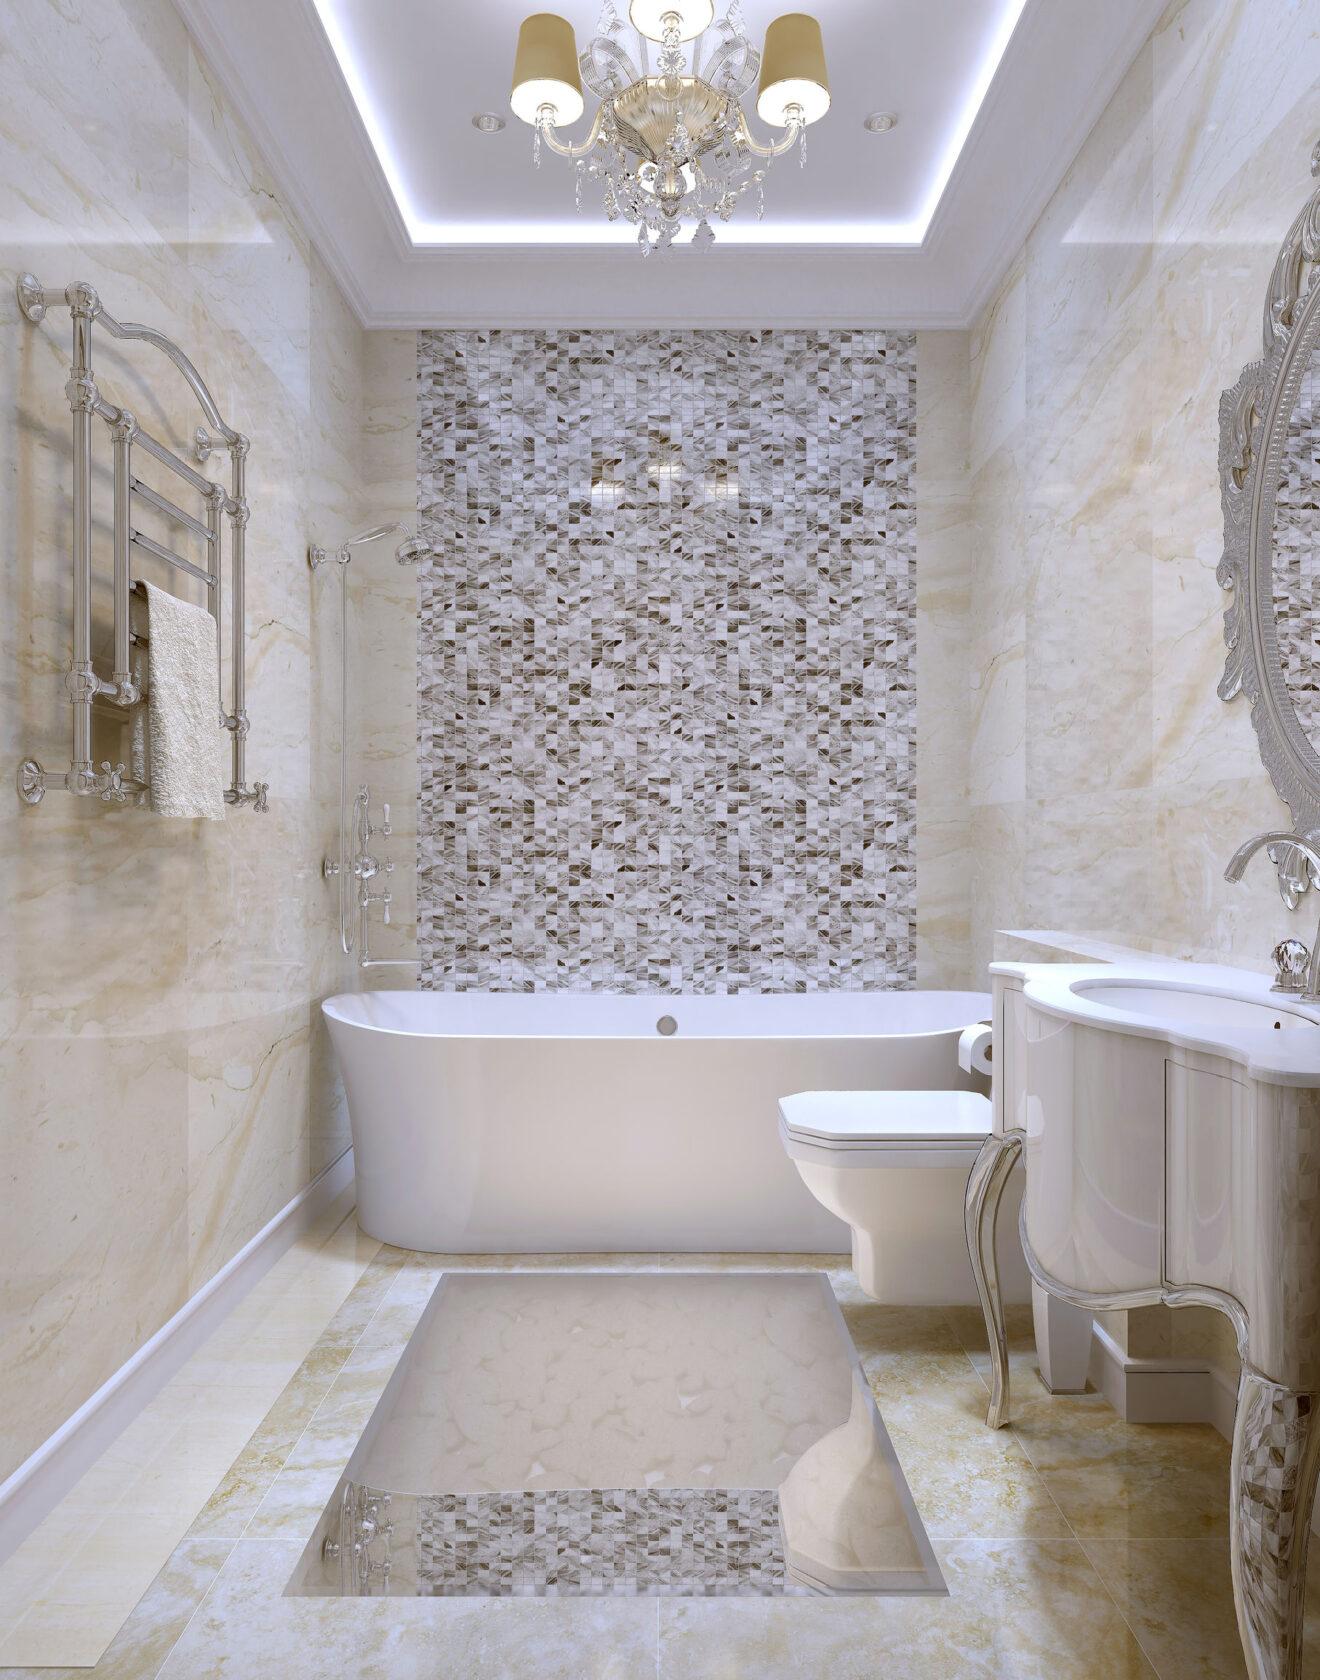 Ottawa Tile Installation - Ottawa Bathroom Renovation Experts